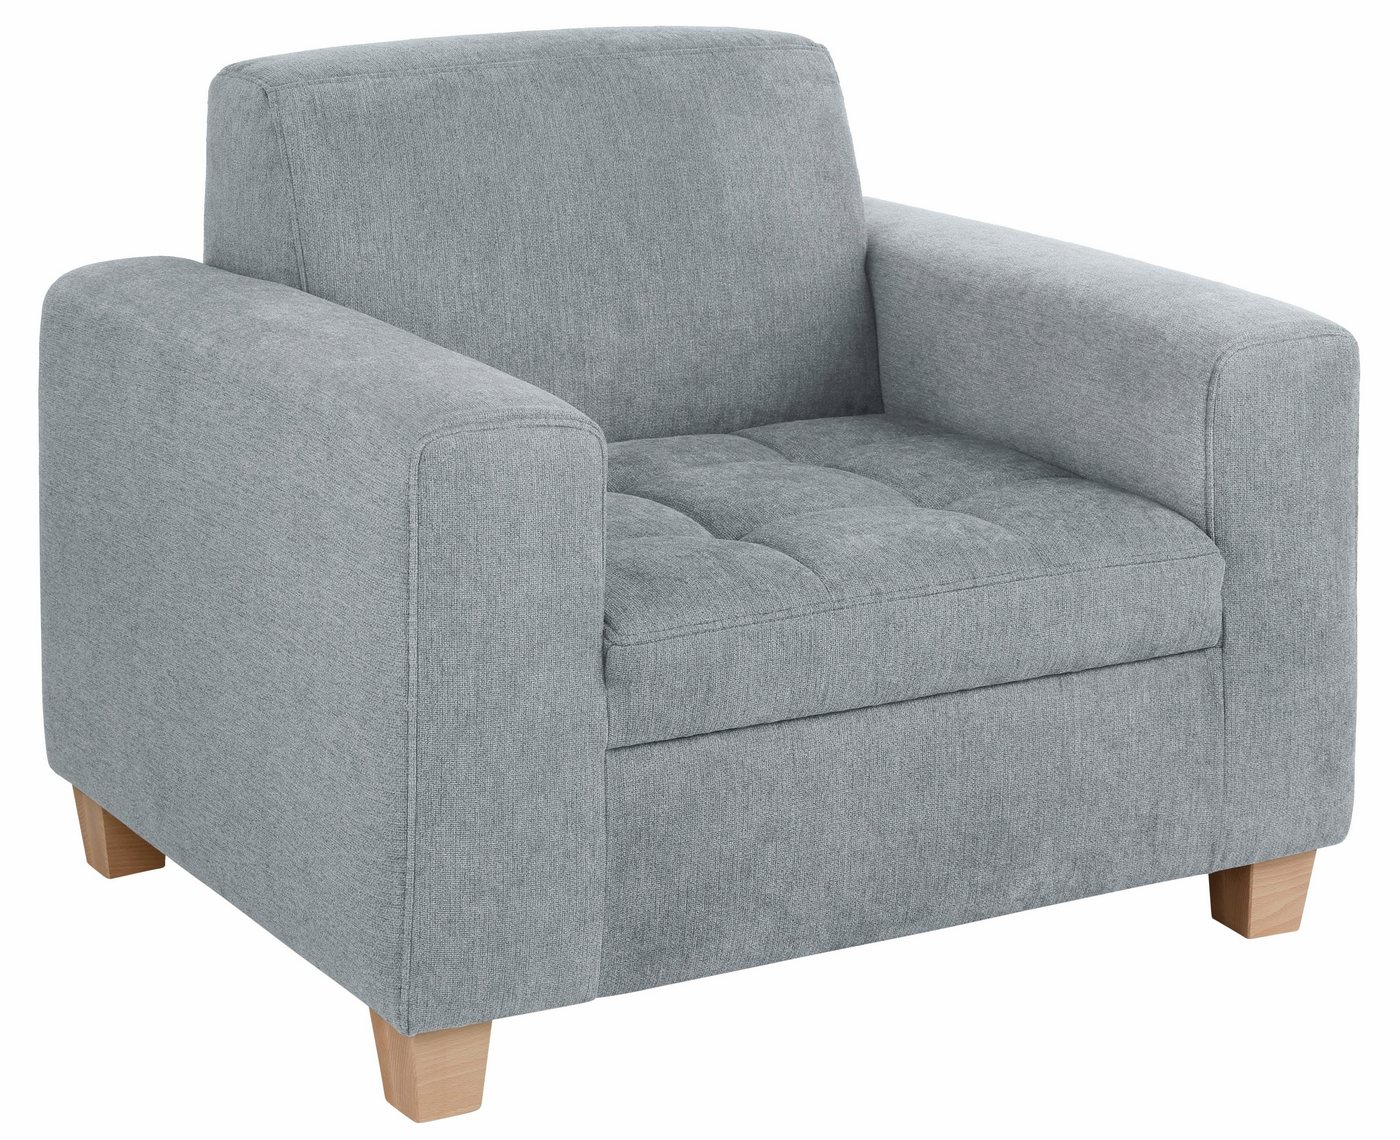 Home affaire fauteuil, stiksels op zitoppervlak